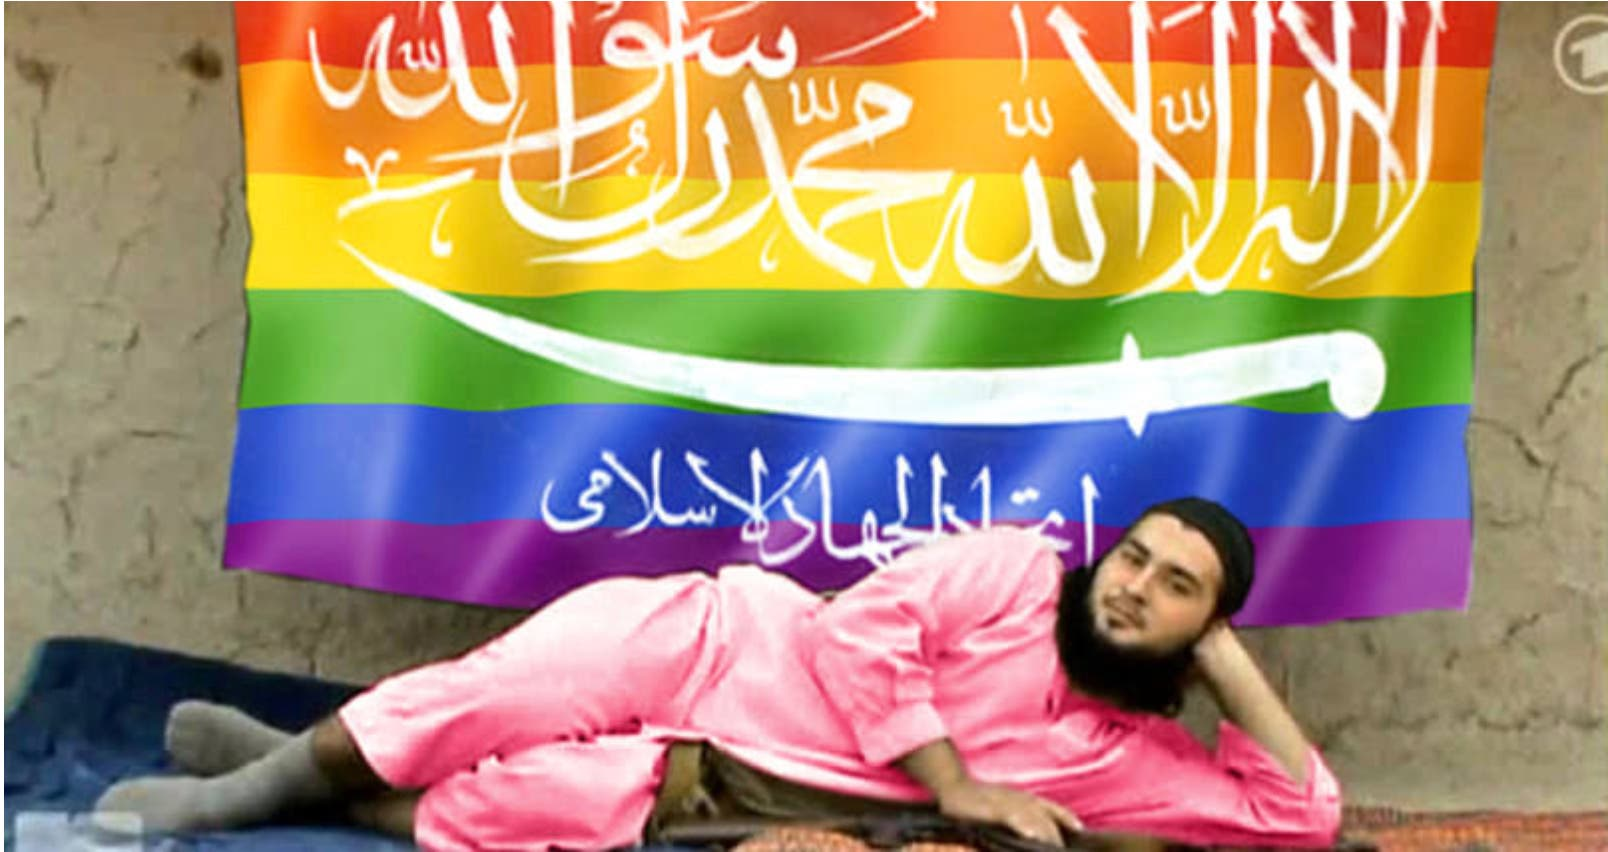 Rencontre gay qatar